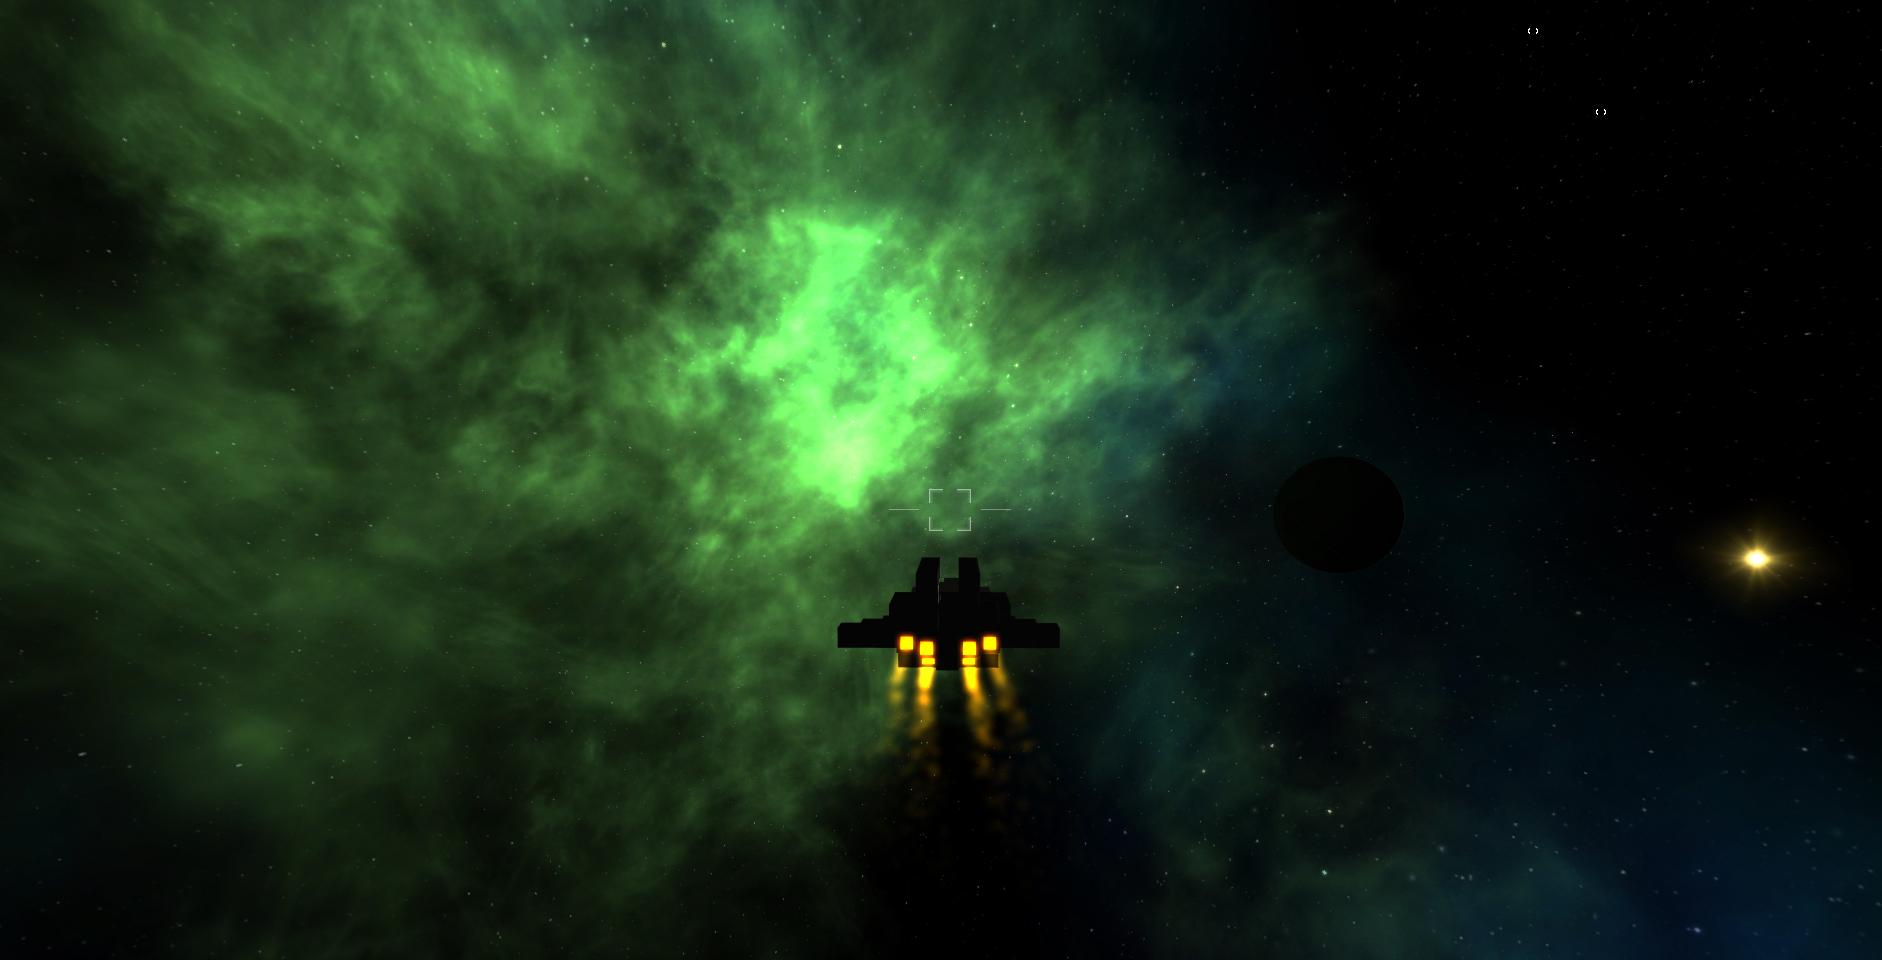 Venator class cruiser entering a green nebula